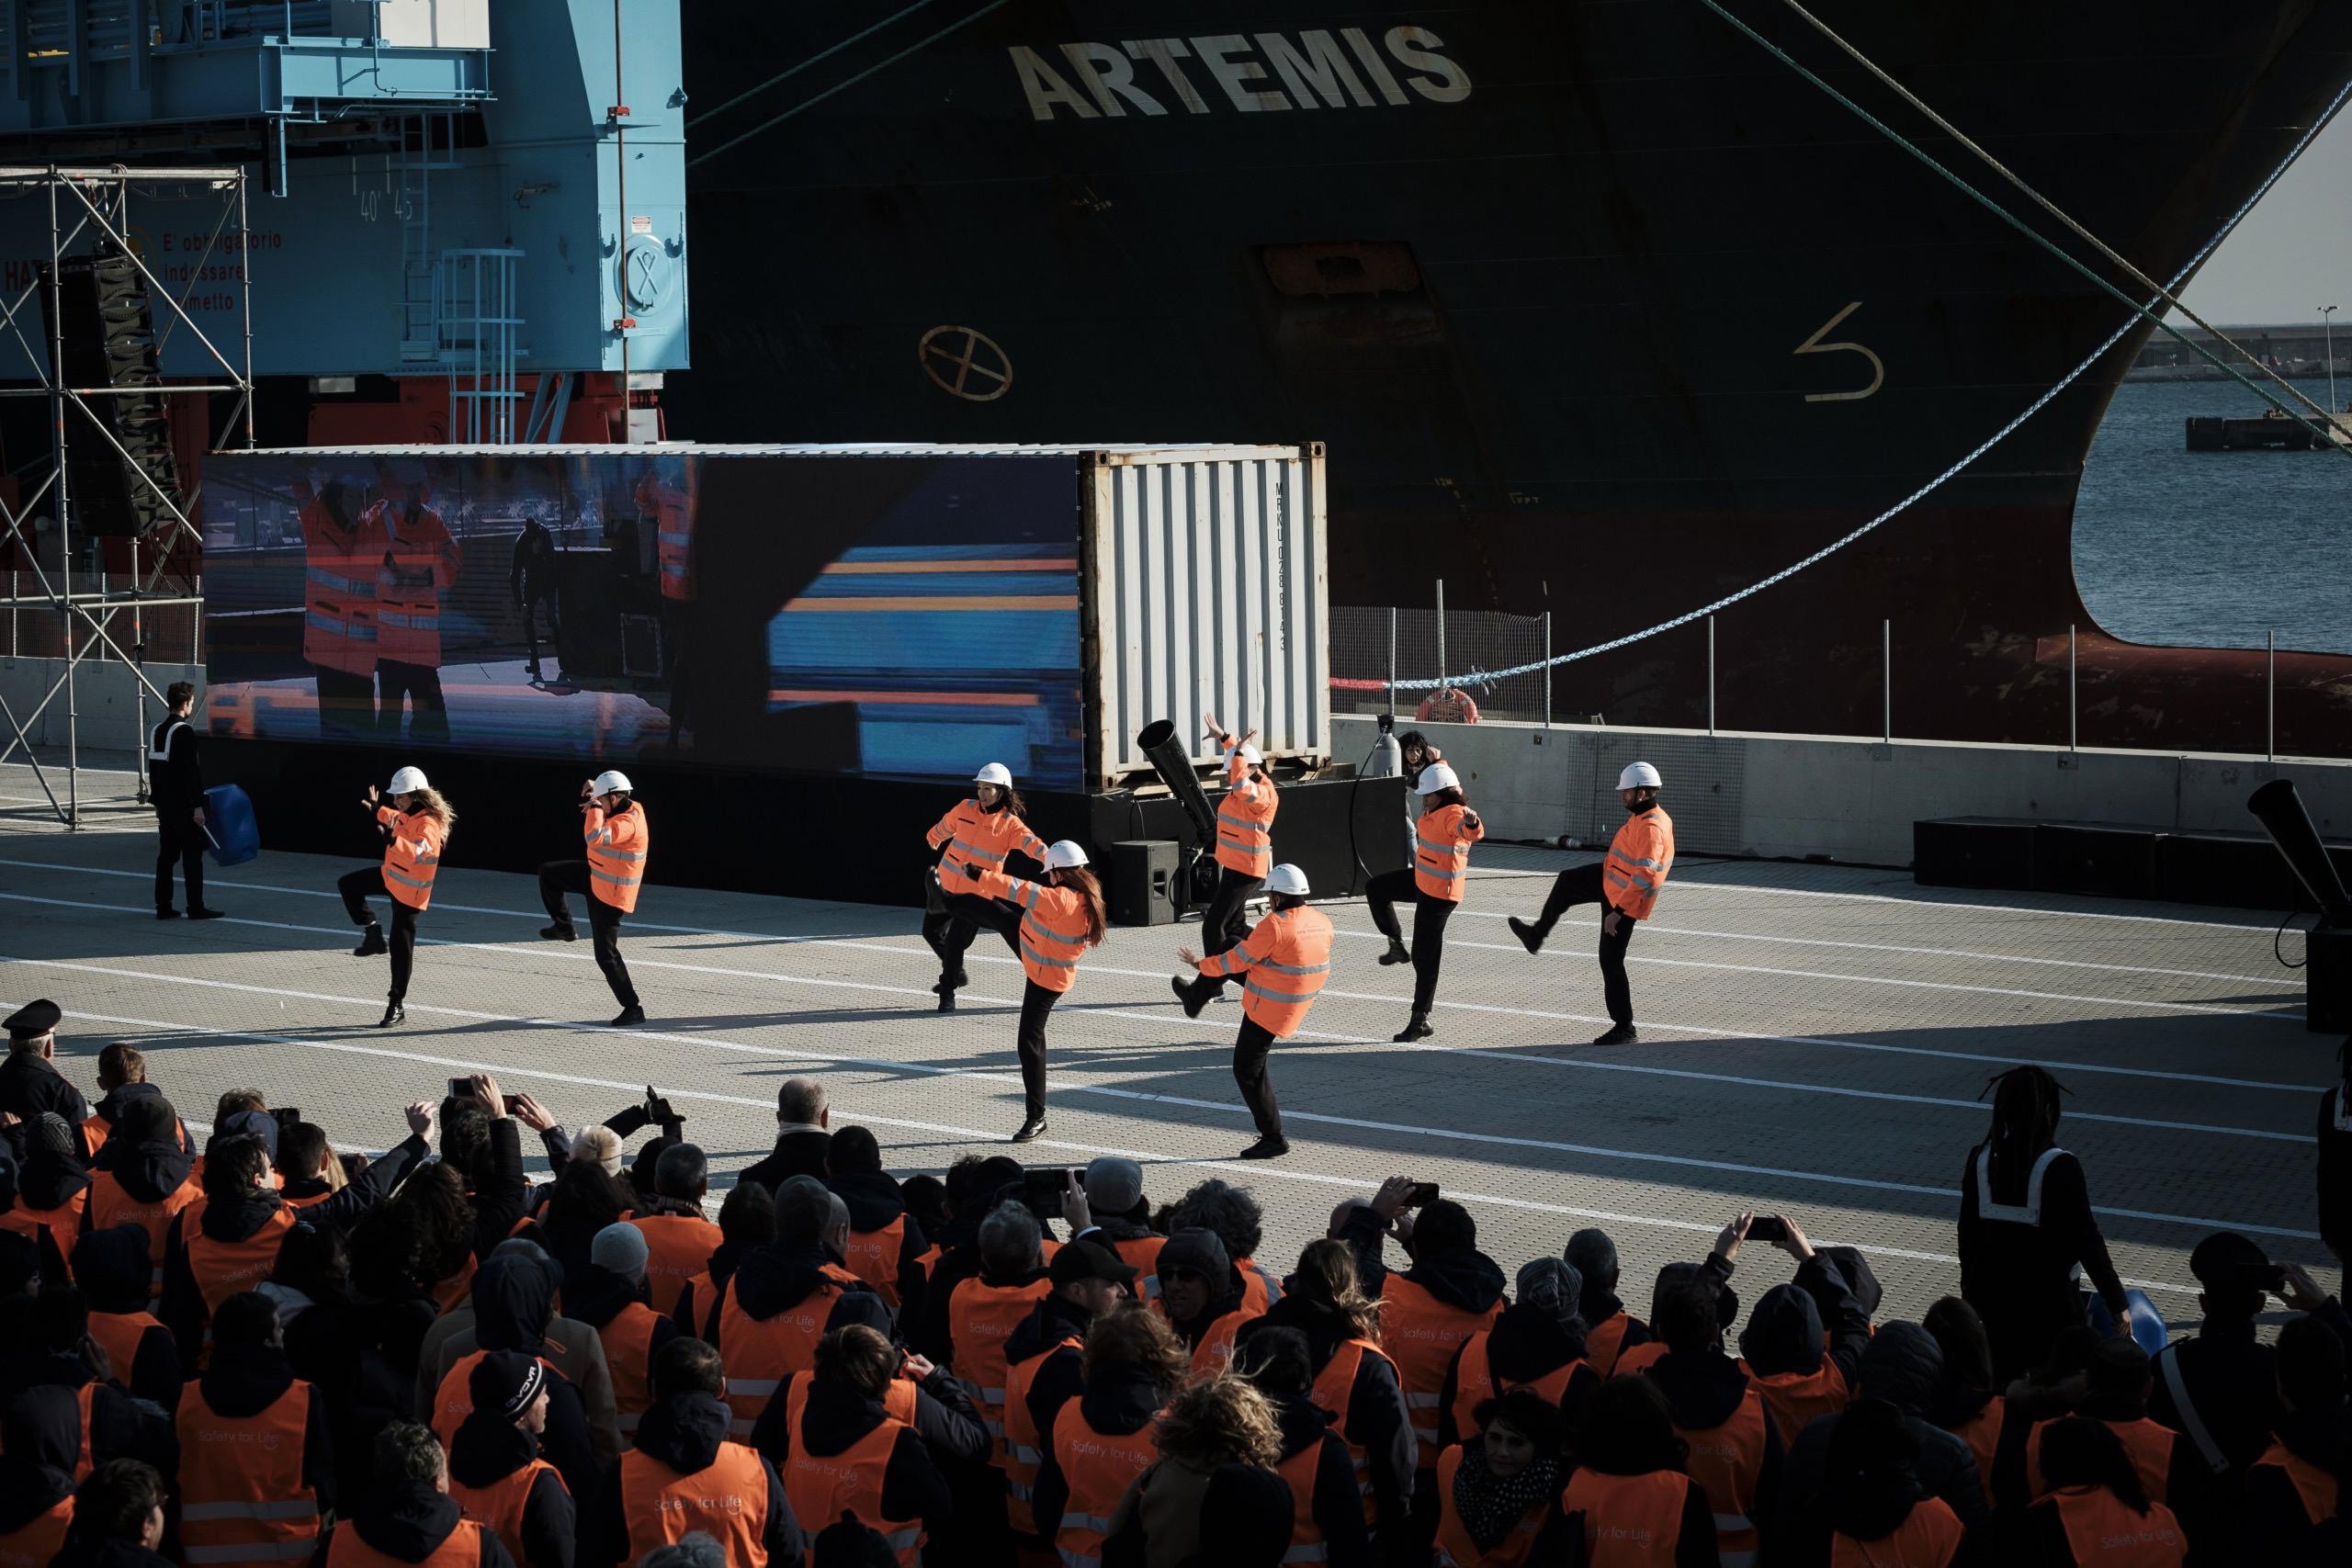 vado-gateway-opening-gruppo-peroni-eventi-04